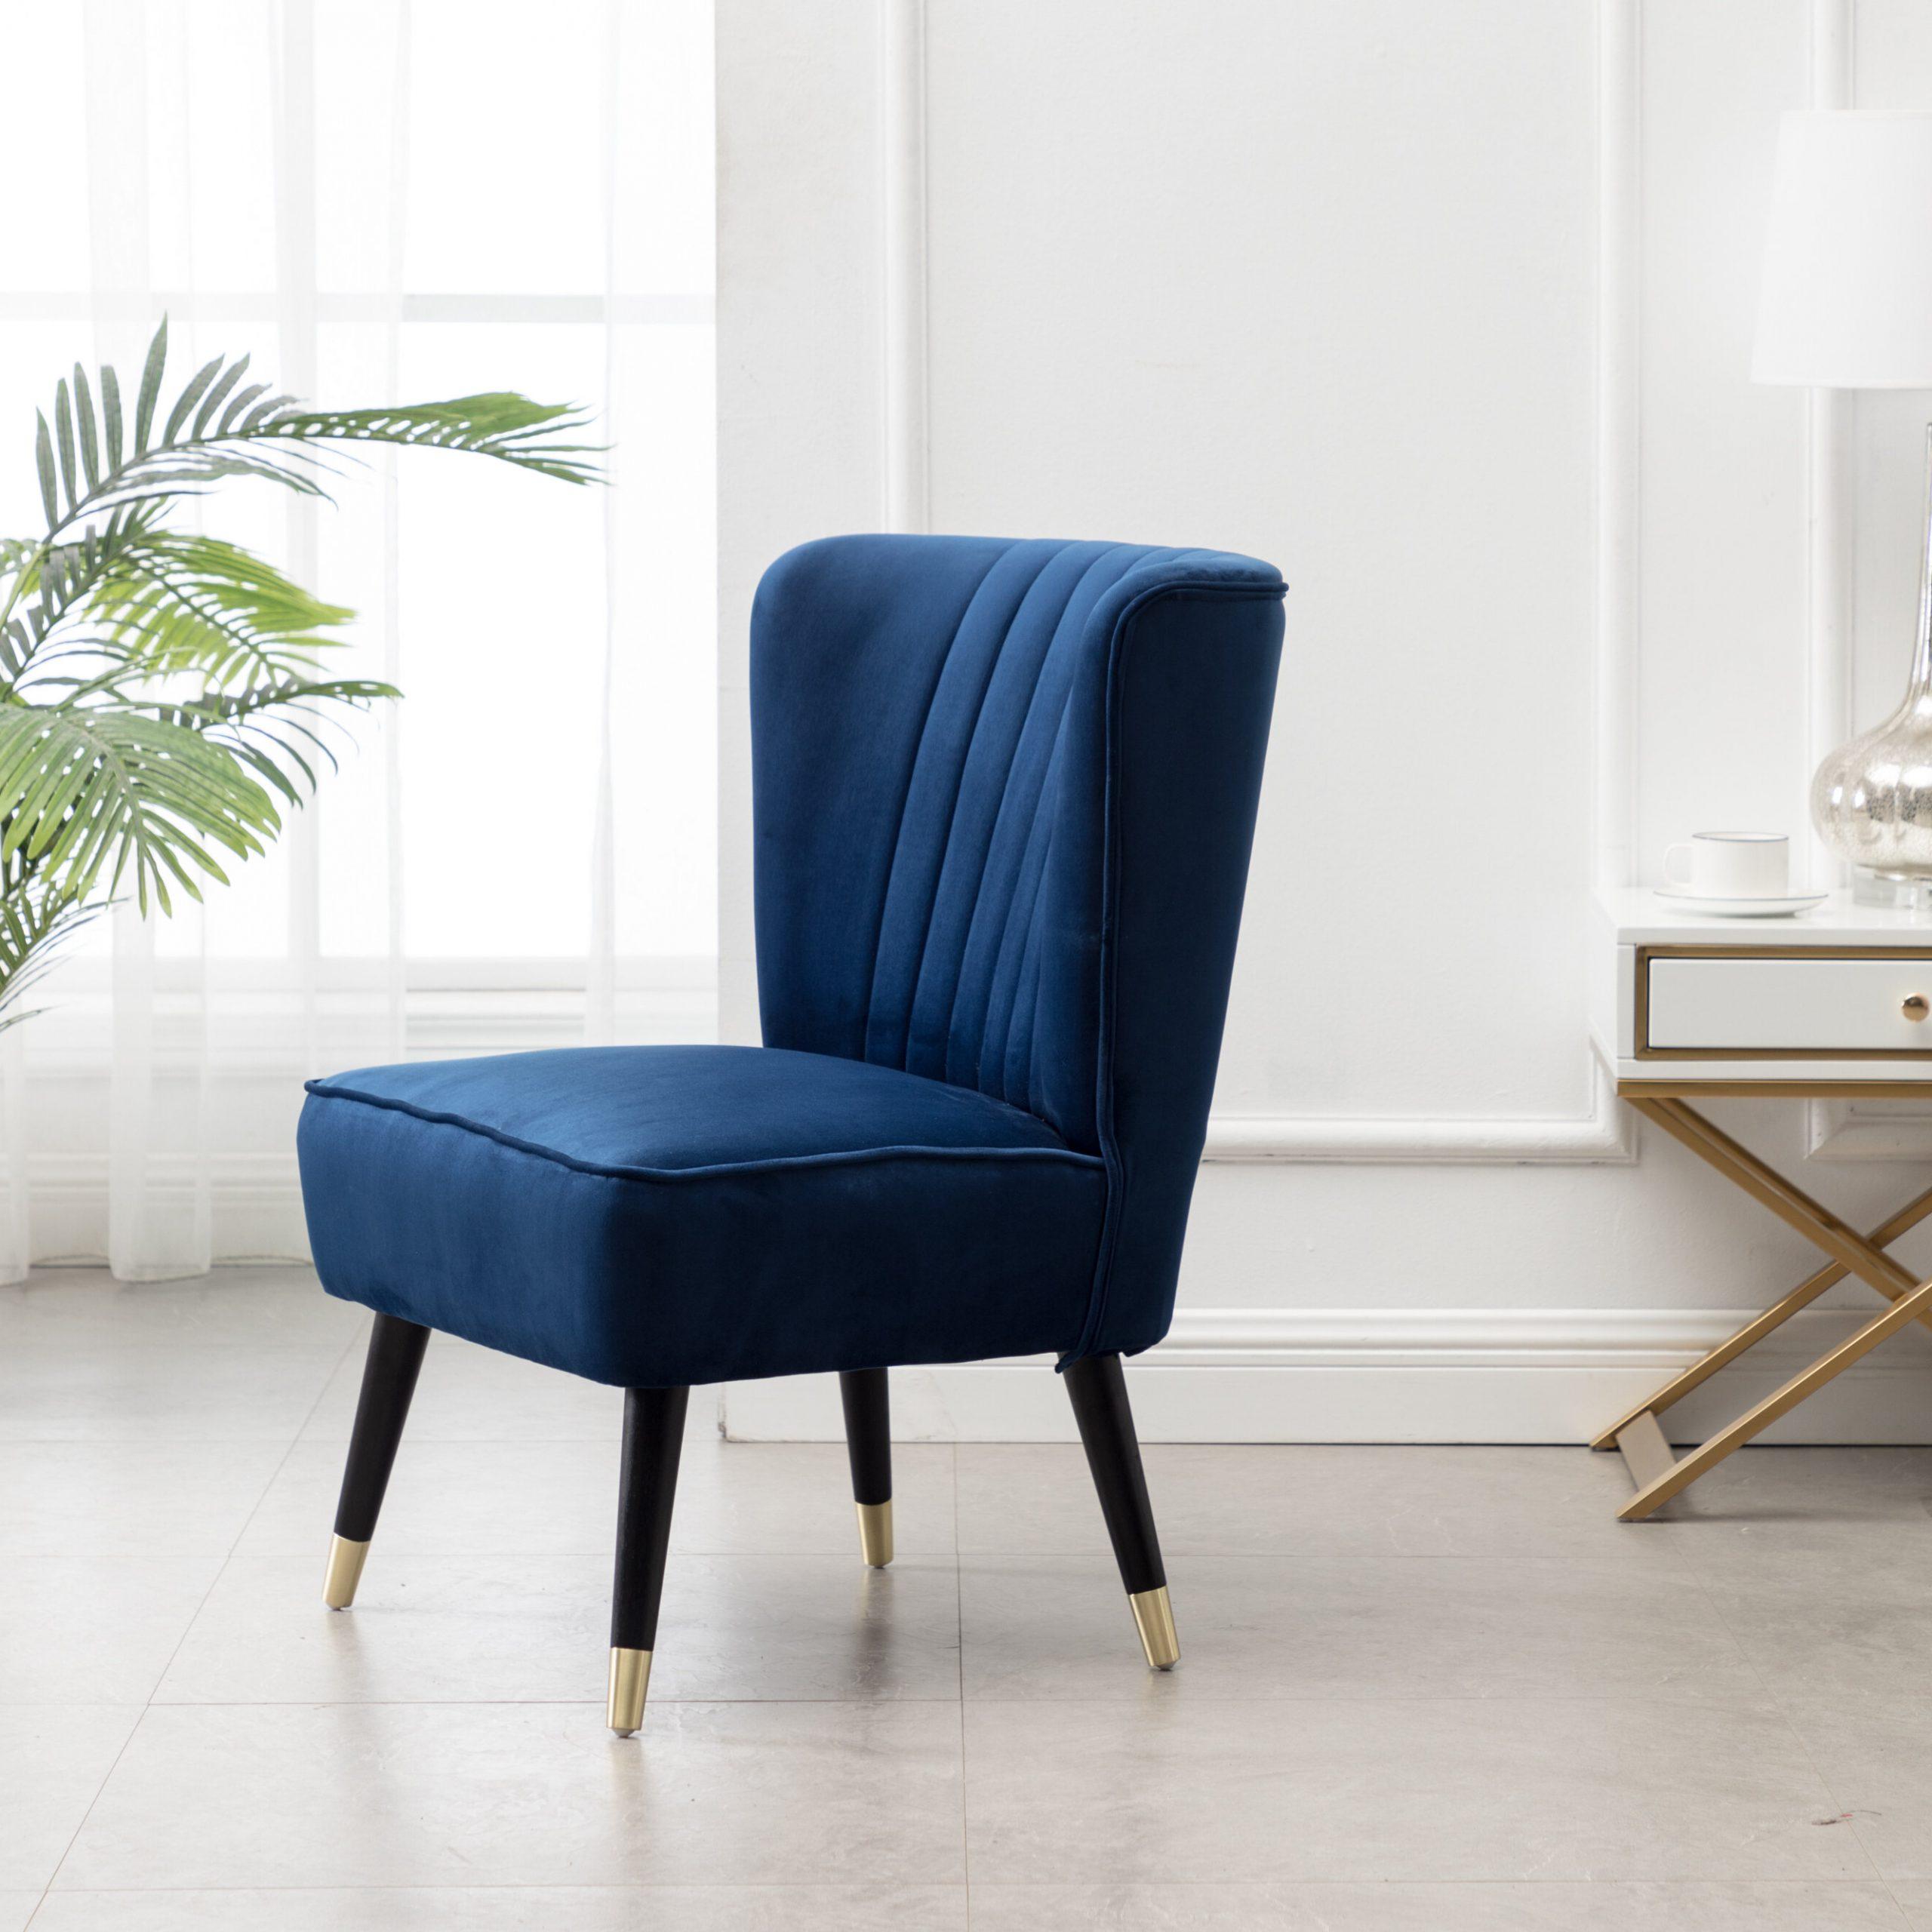 Widely Used Easterling Velvet Slipper Chairs In Billiot Contemporary Velvet Upholstered Accent Chair, Blue (View 20 of 20)